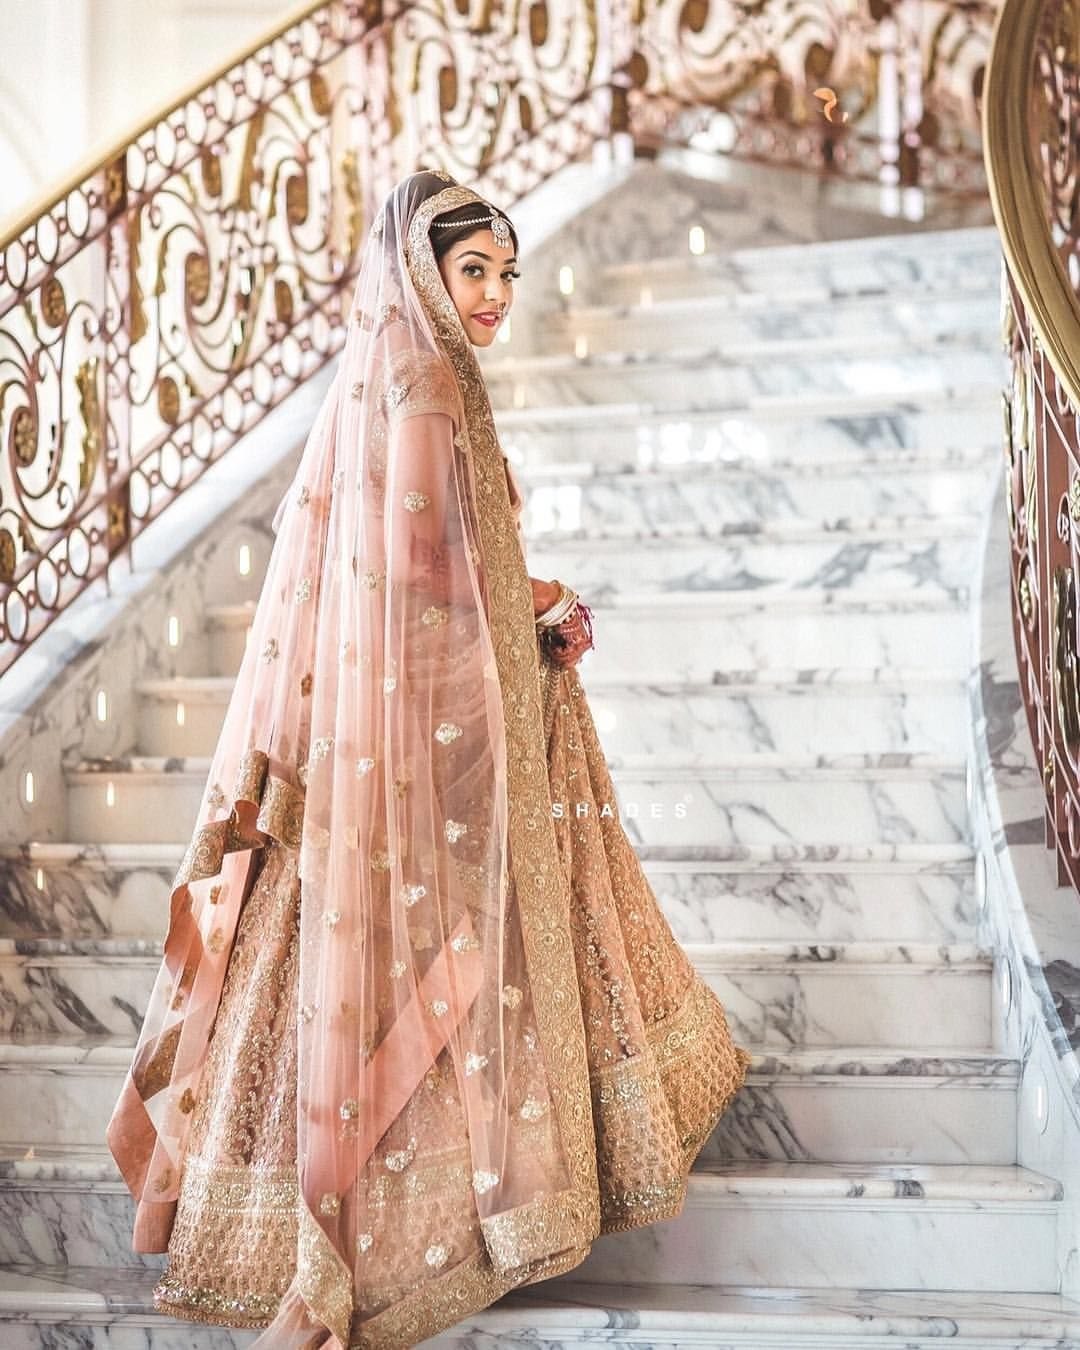 Ashwin Jhalak Shadesphotographyindia On Instagram Paayel Karan Dubai MUA Angeliqueturner Lehenga Sabyasachiofficial Wedding Planner